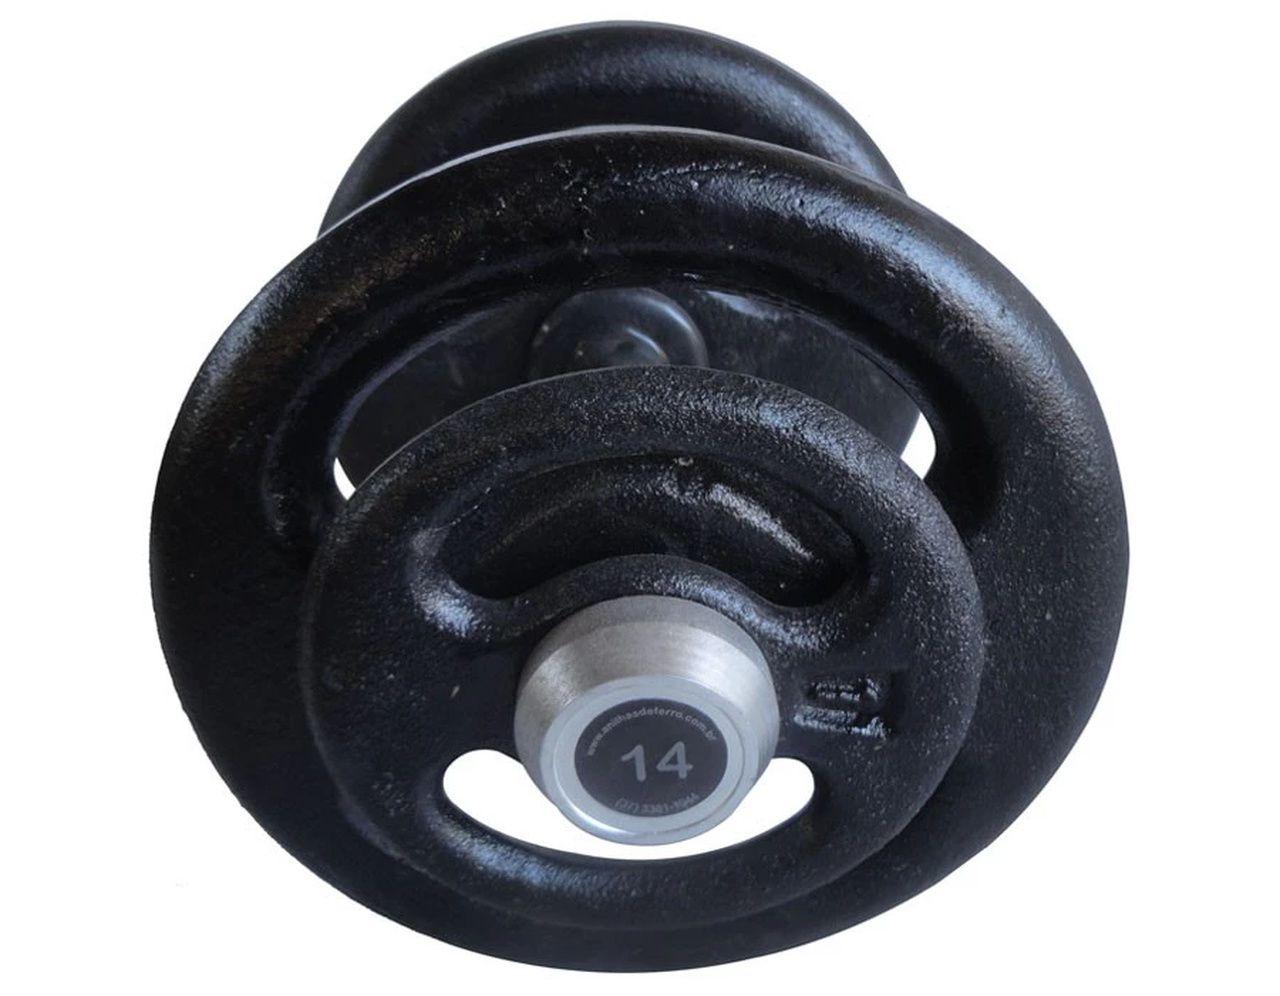 Dumbbell Pintado Pegada Emborrachada Academia Fitness 14kg  - Panela de Ferro Fundido